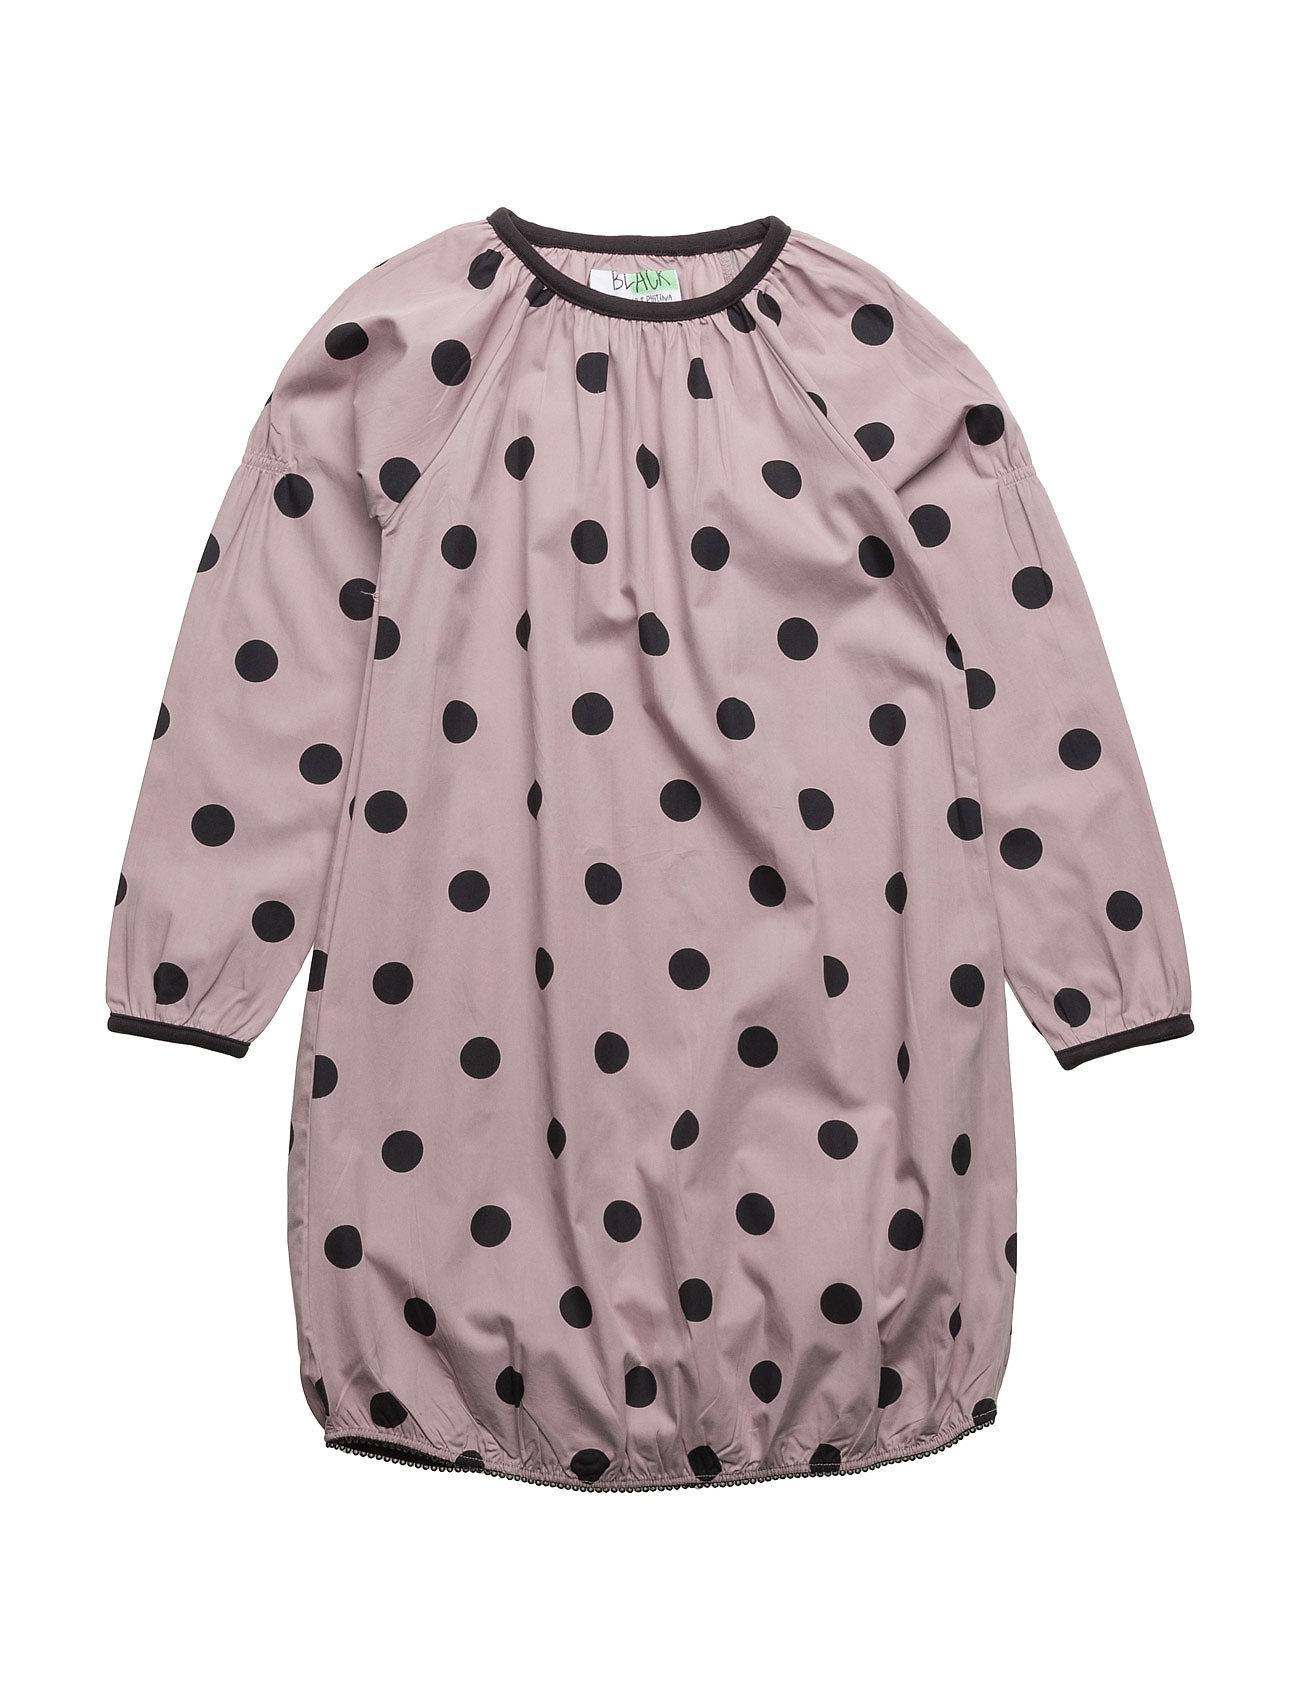 Malou Polka Dress Phister & Philina Kjoler til Børn i